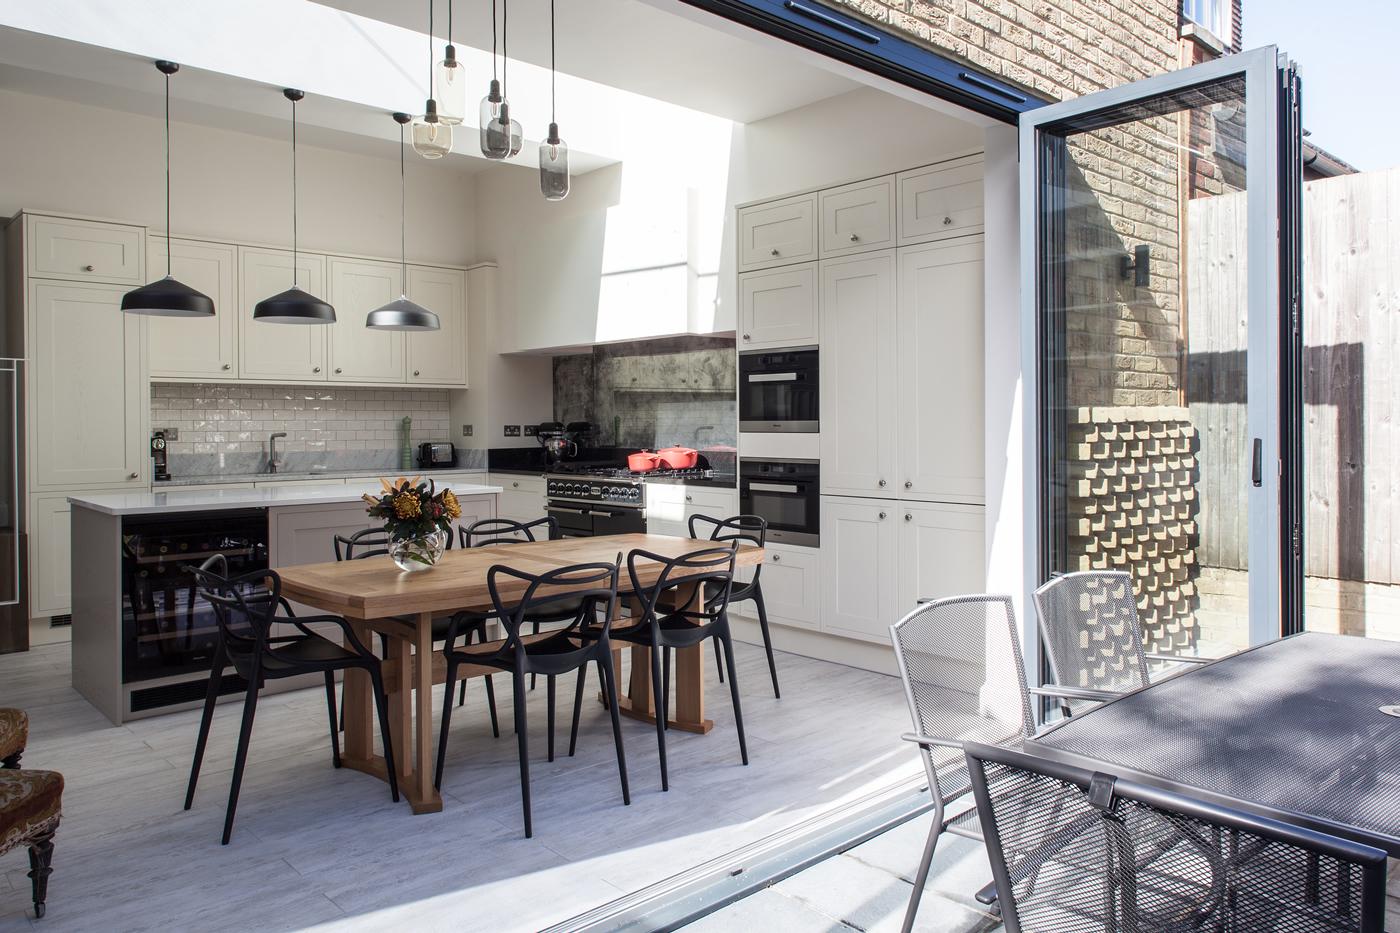 Harcourt Road East – Kitchen / diner extension